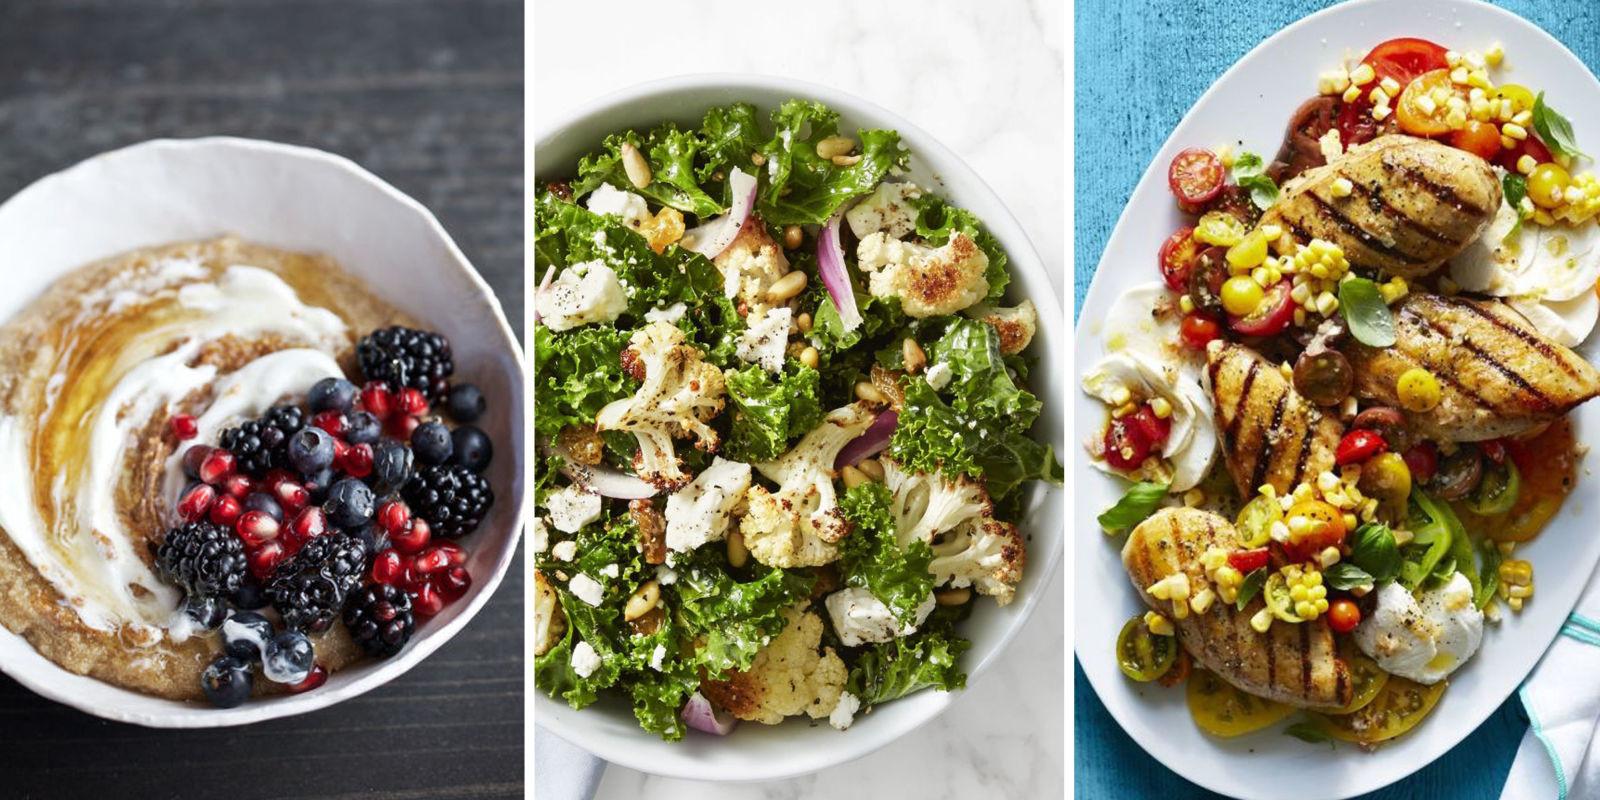 Heart Healthy Breakfast Ideas  Heart Healthy Recipes for Breakfast Lunch Dinner and